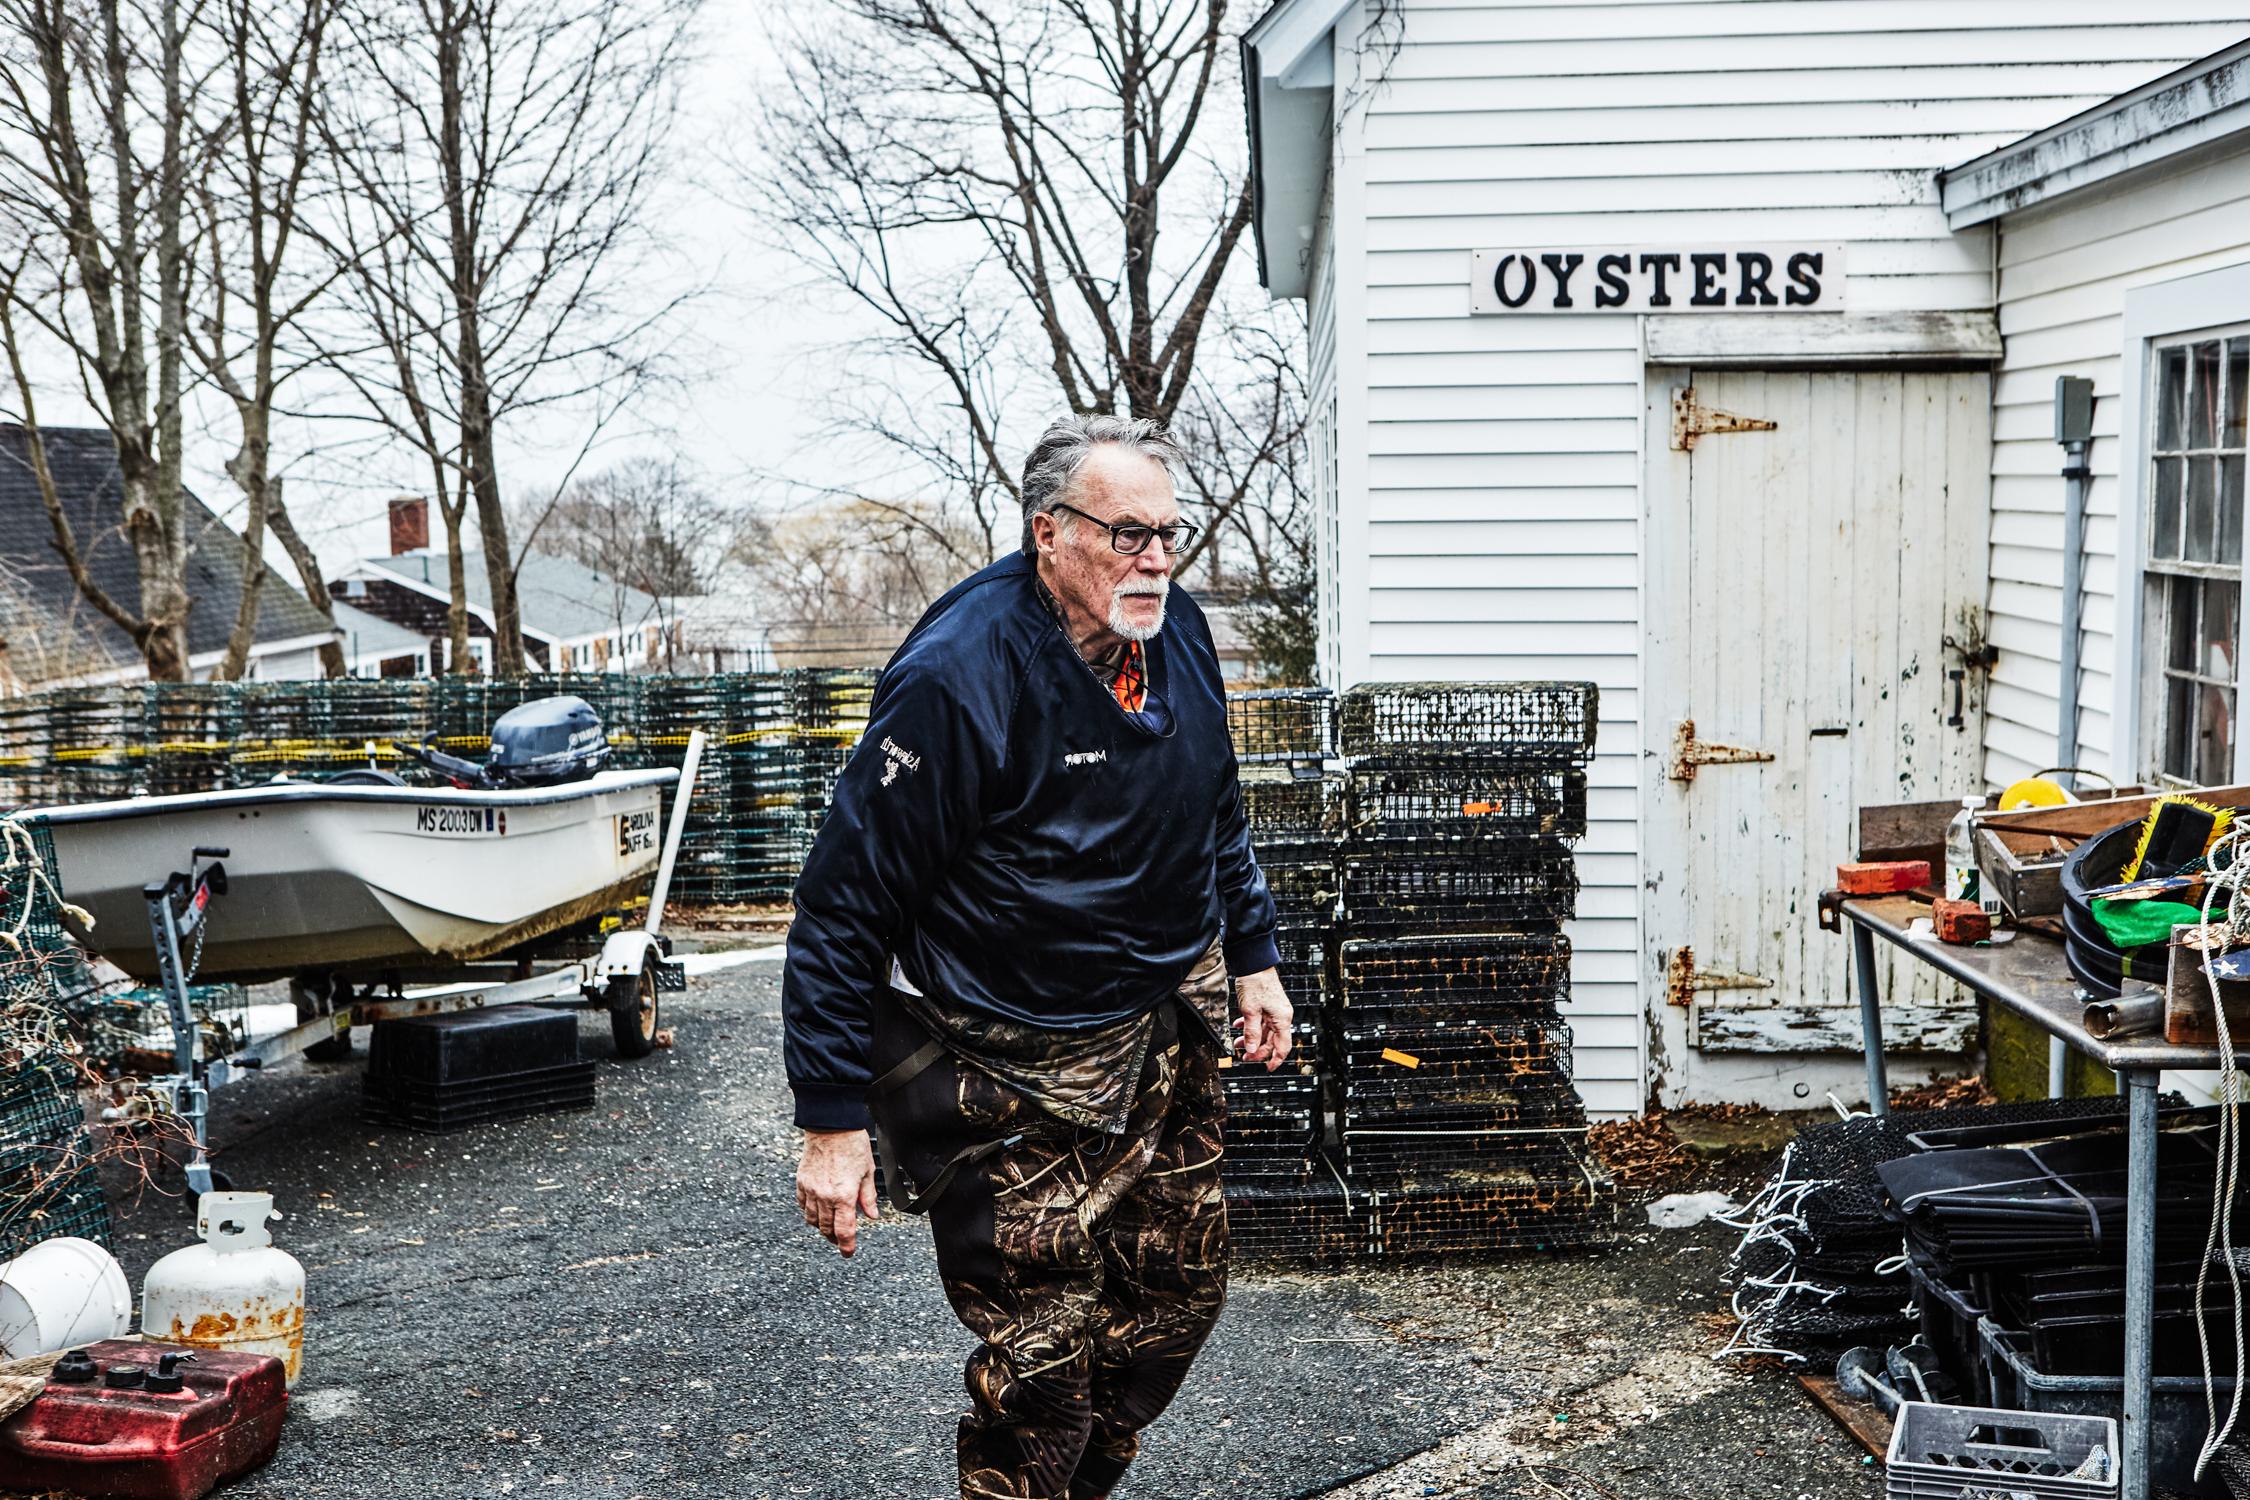 oysters_15.jpg